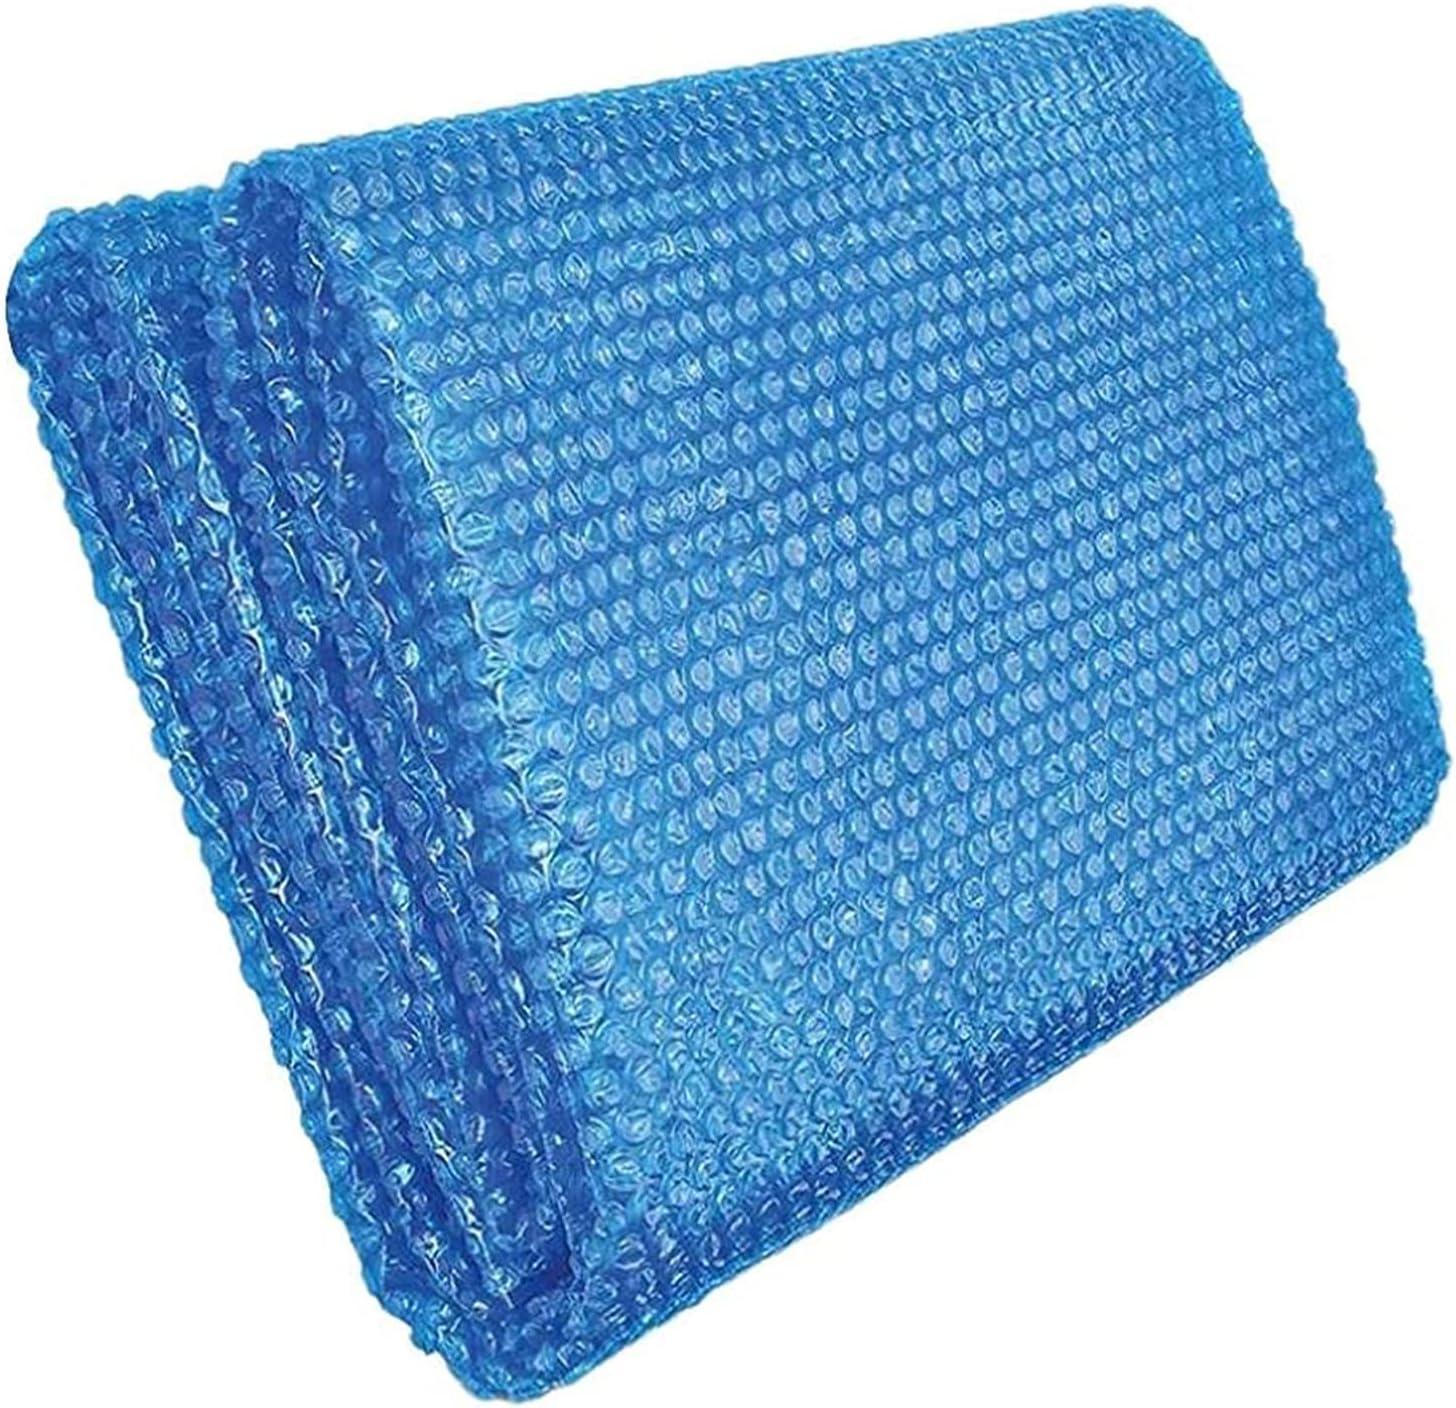 Cubierta Piscina/Cobertor Piscina/ Funda Piscina Cubierta Solar Para Piscinas Exteriores Para Piscinas Elevadas, Azul Manta Térmica Protectora Endotérmica Flotante De Alta Resistencia Resistente Al Ag